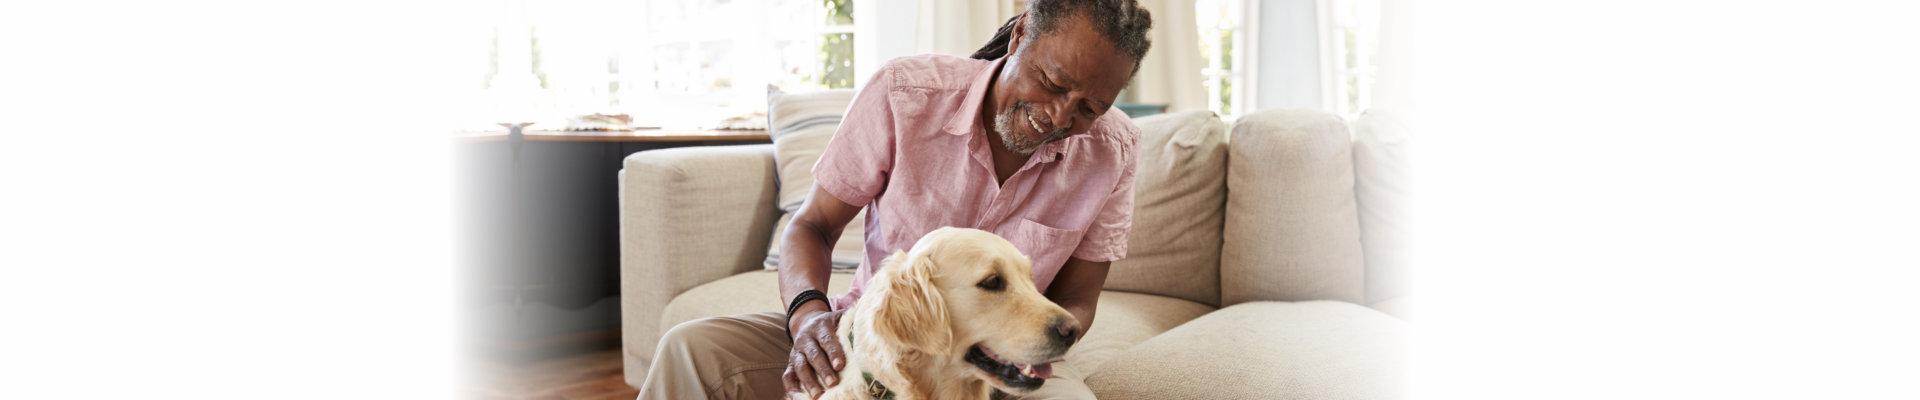 adult man petting a dog